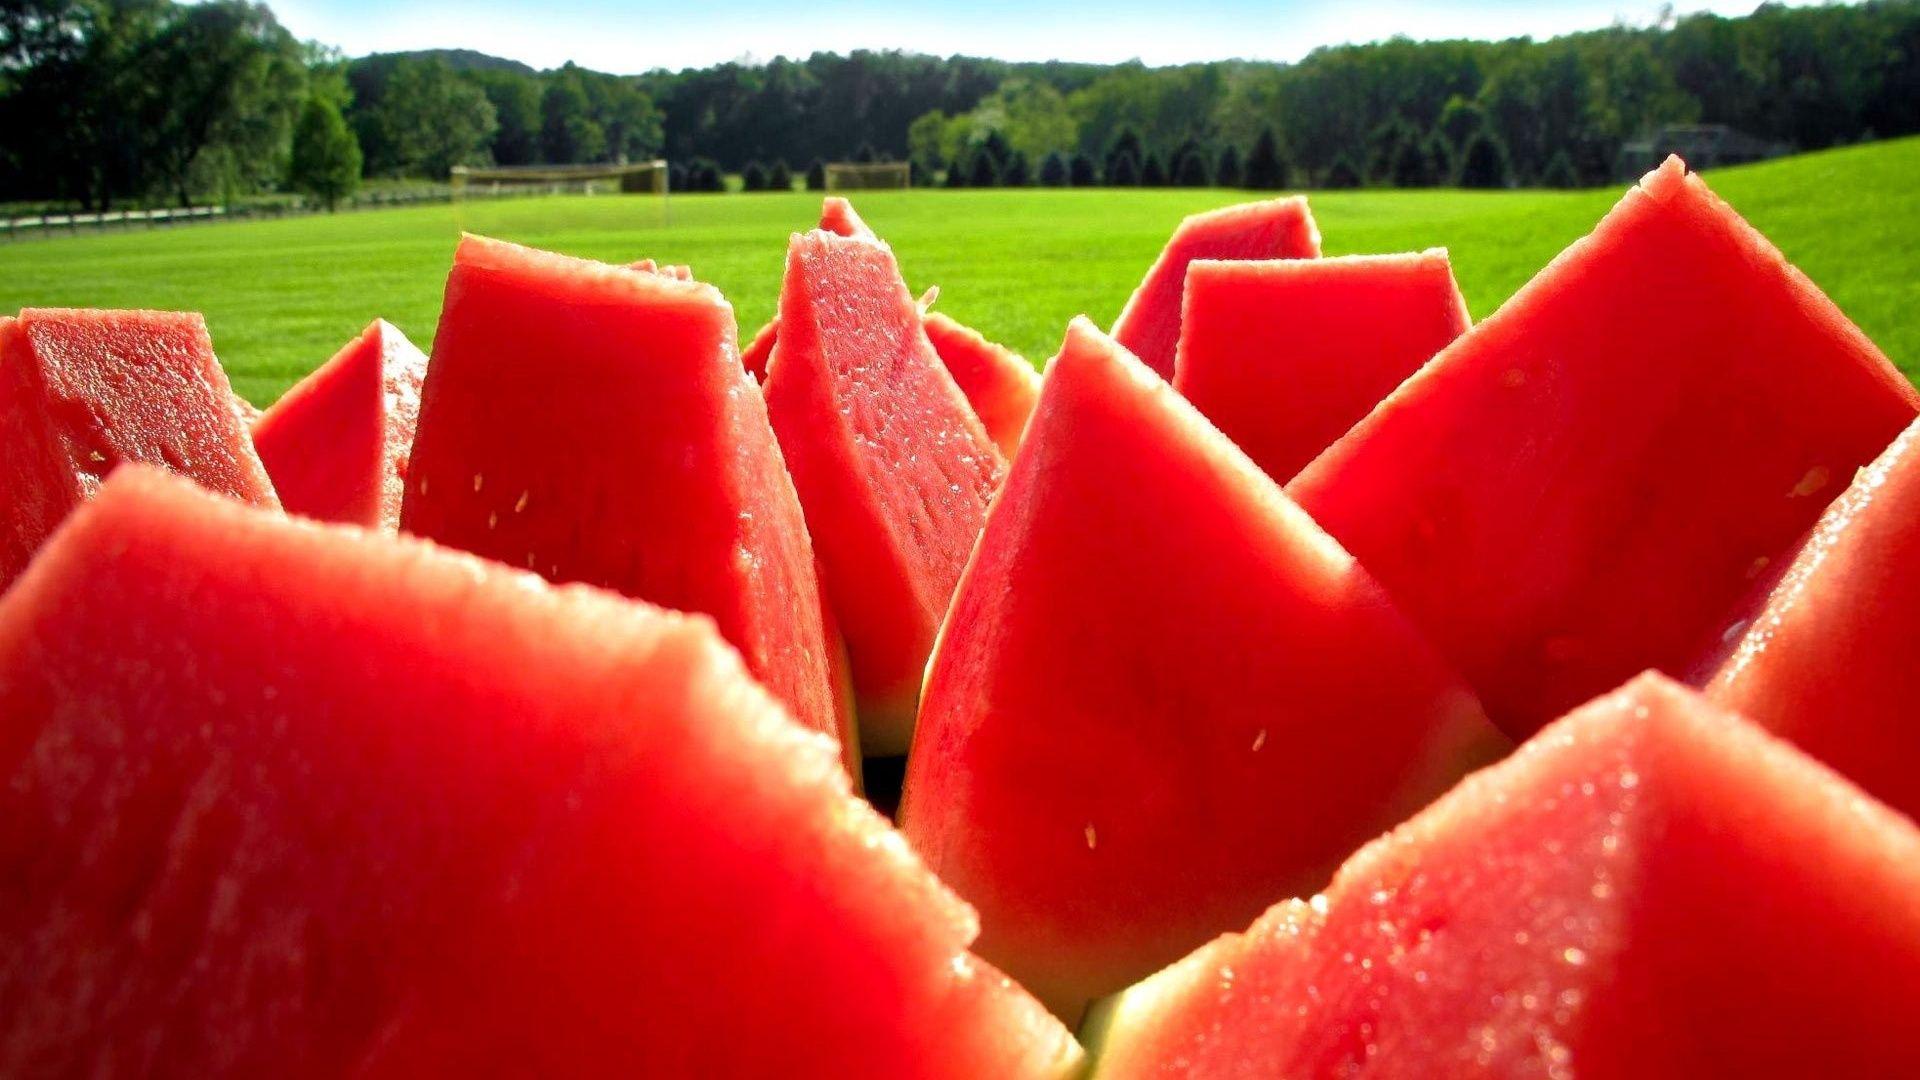 watermelon graphics